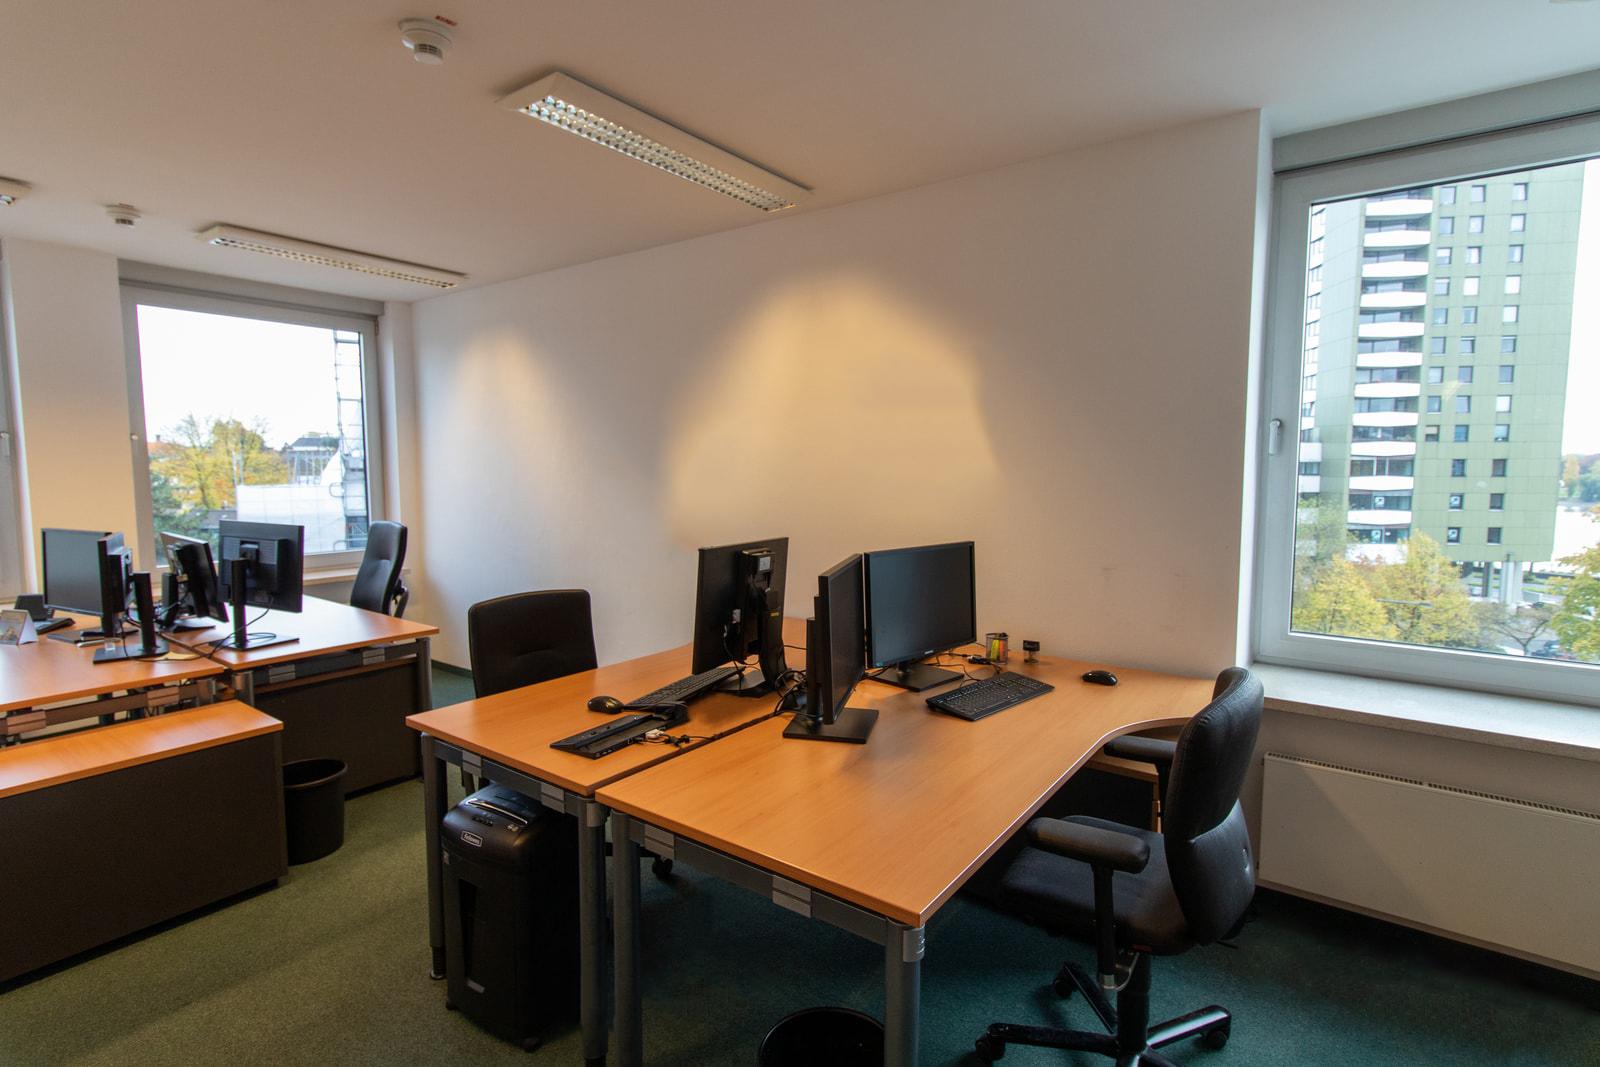 office 1 Theodor-Heuss-Ring 23